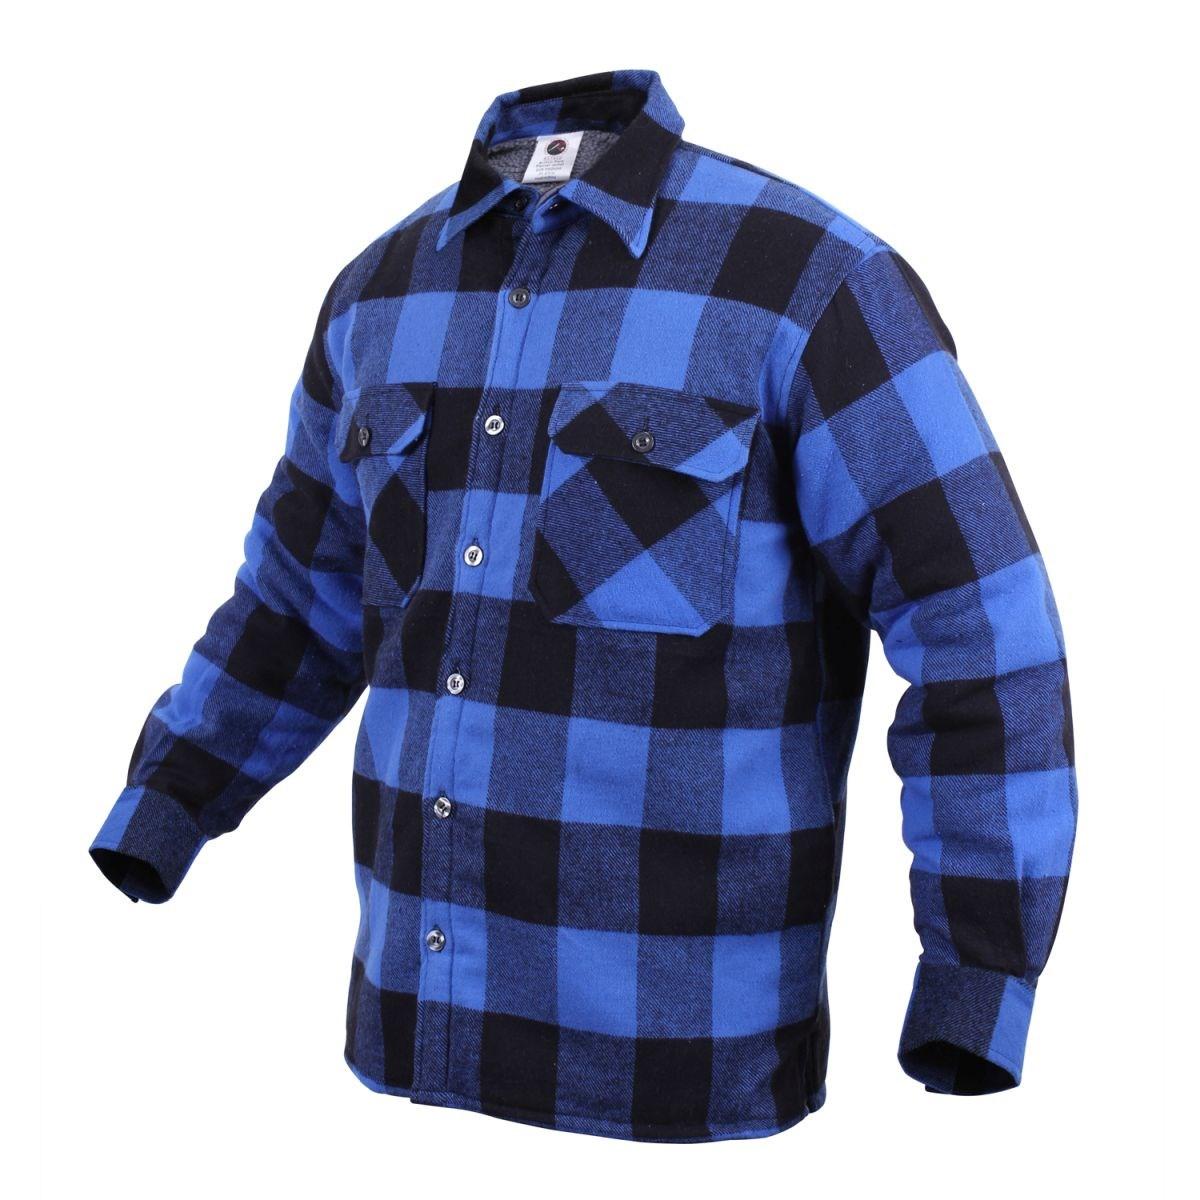 Košile dřevorubecká zateplená kostkovaná MODRÁ ROTHCO 3739BLU L-11